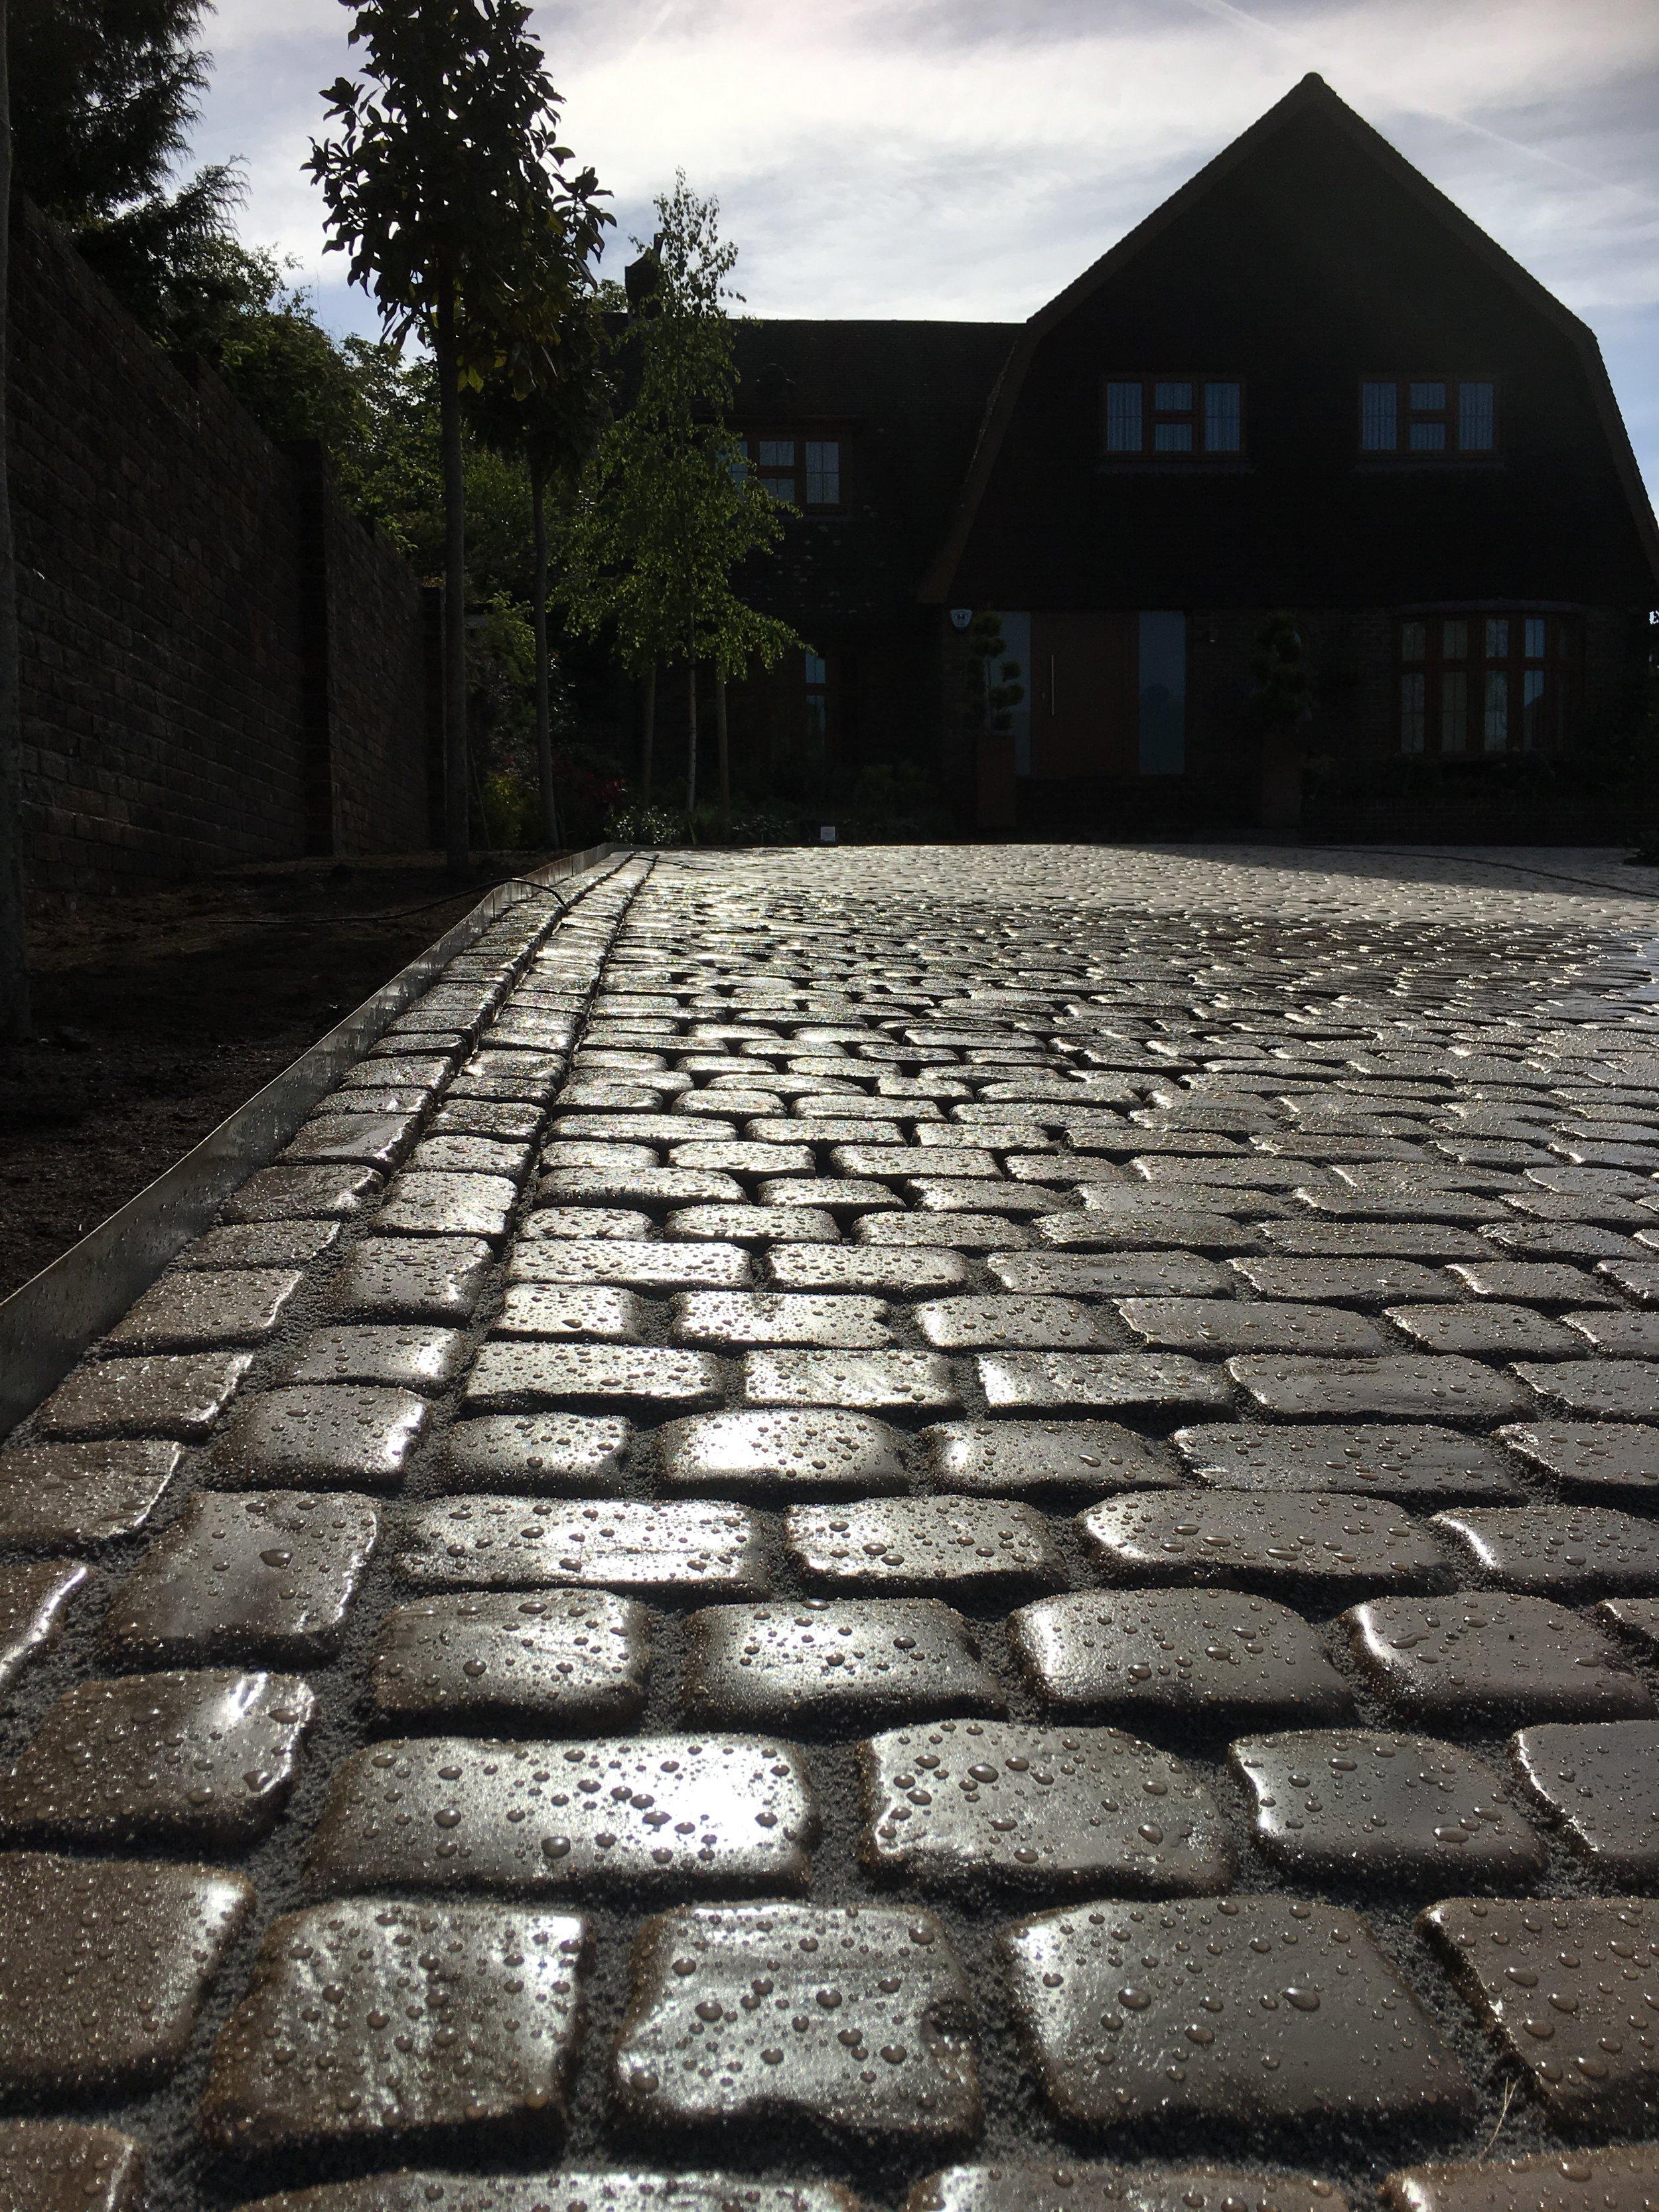 Marshalls Drivesys Paving on this stunning driveway